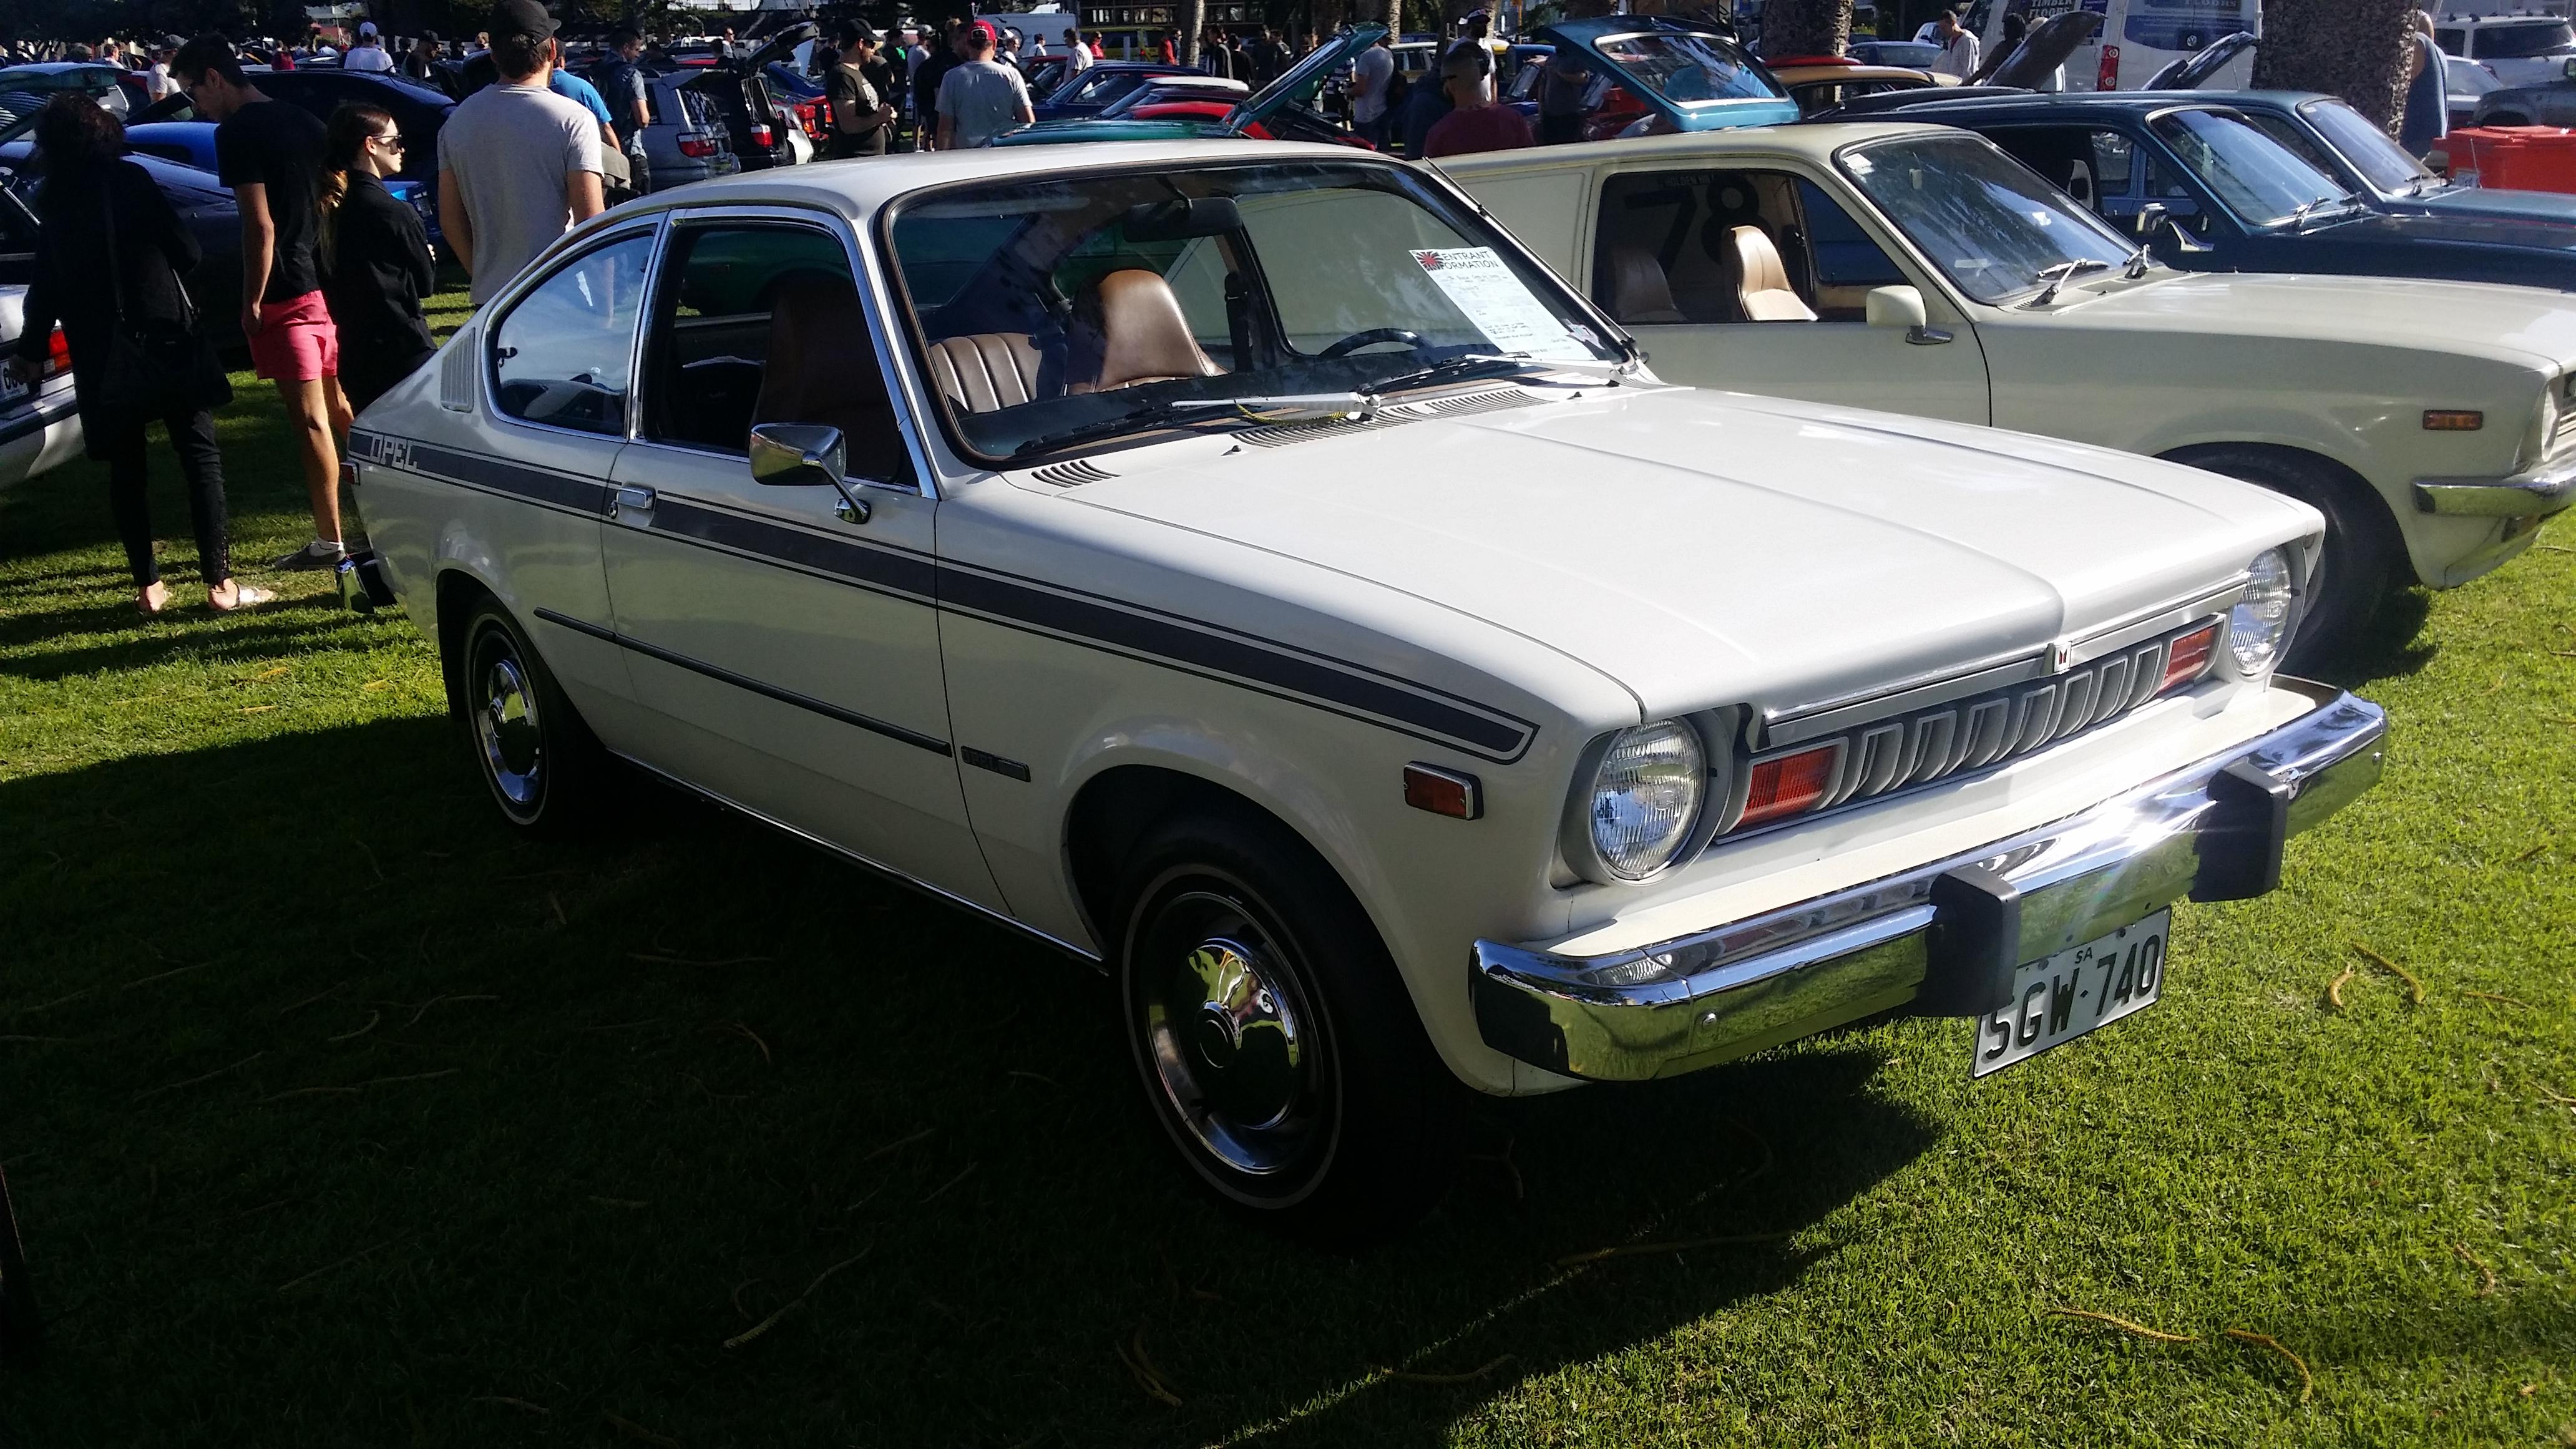 Buick T Type >> File:1976 Buick Opel - 90,000km (16815117771).jpg - Wikipedia